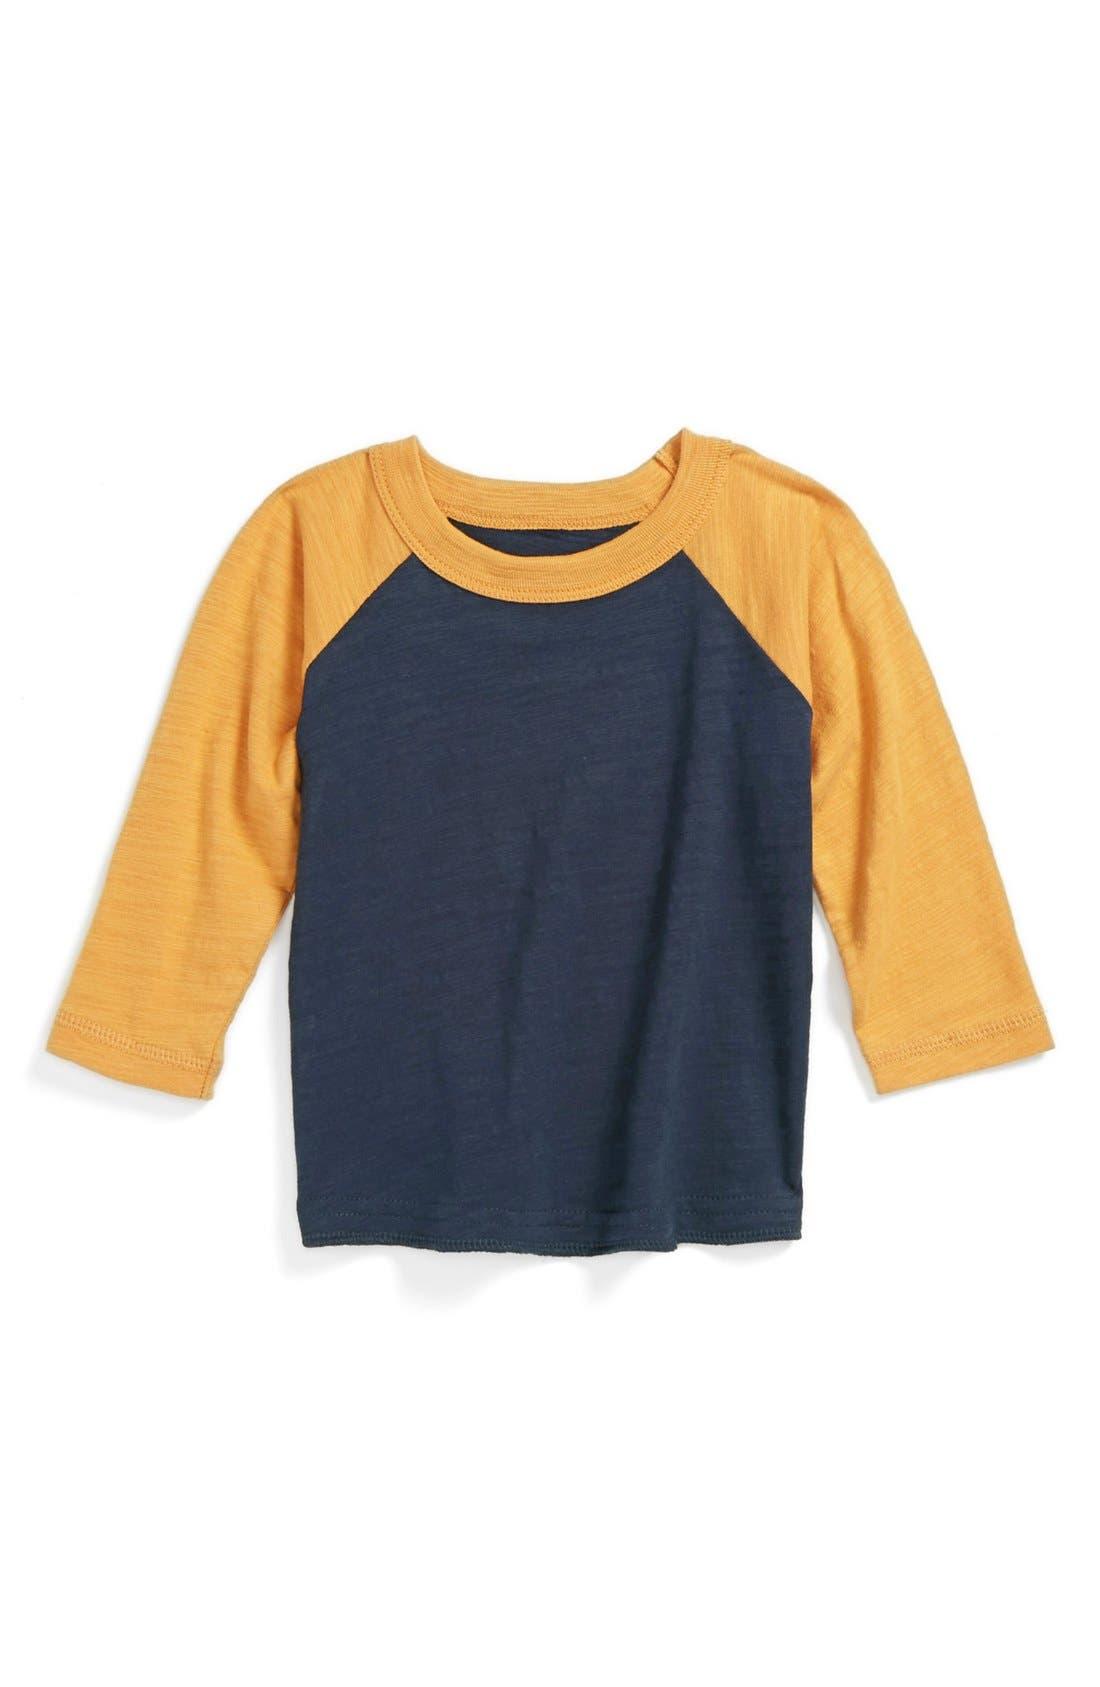 Main Image - Peek 'Field' Long Sleeve T-Shirt (Baby Boys)